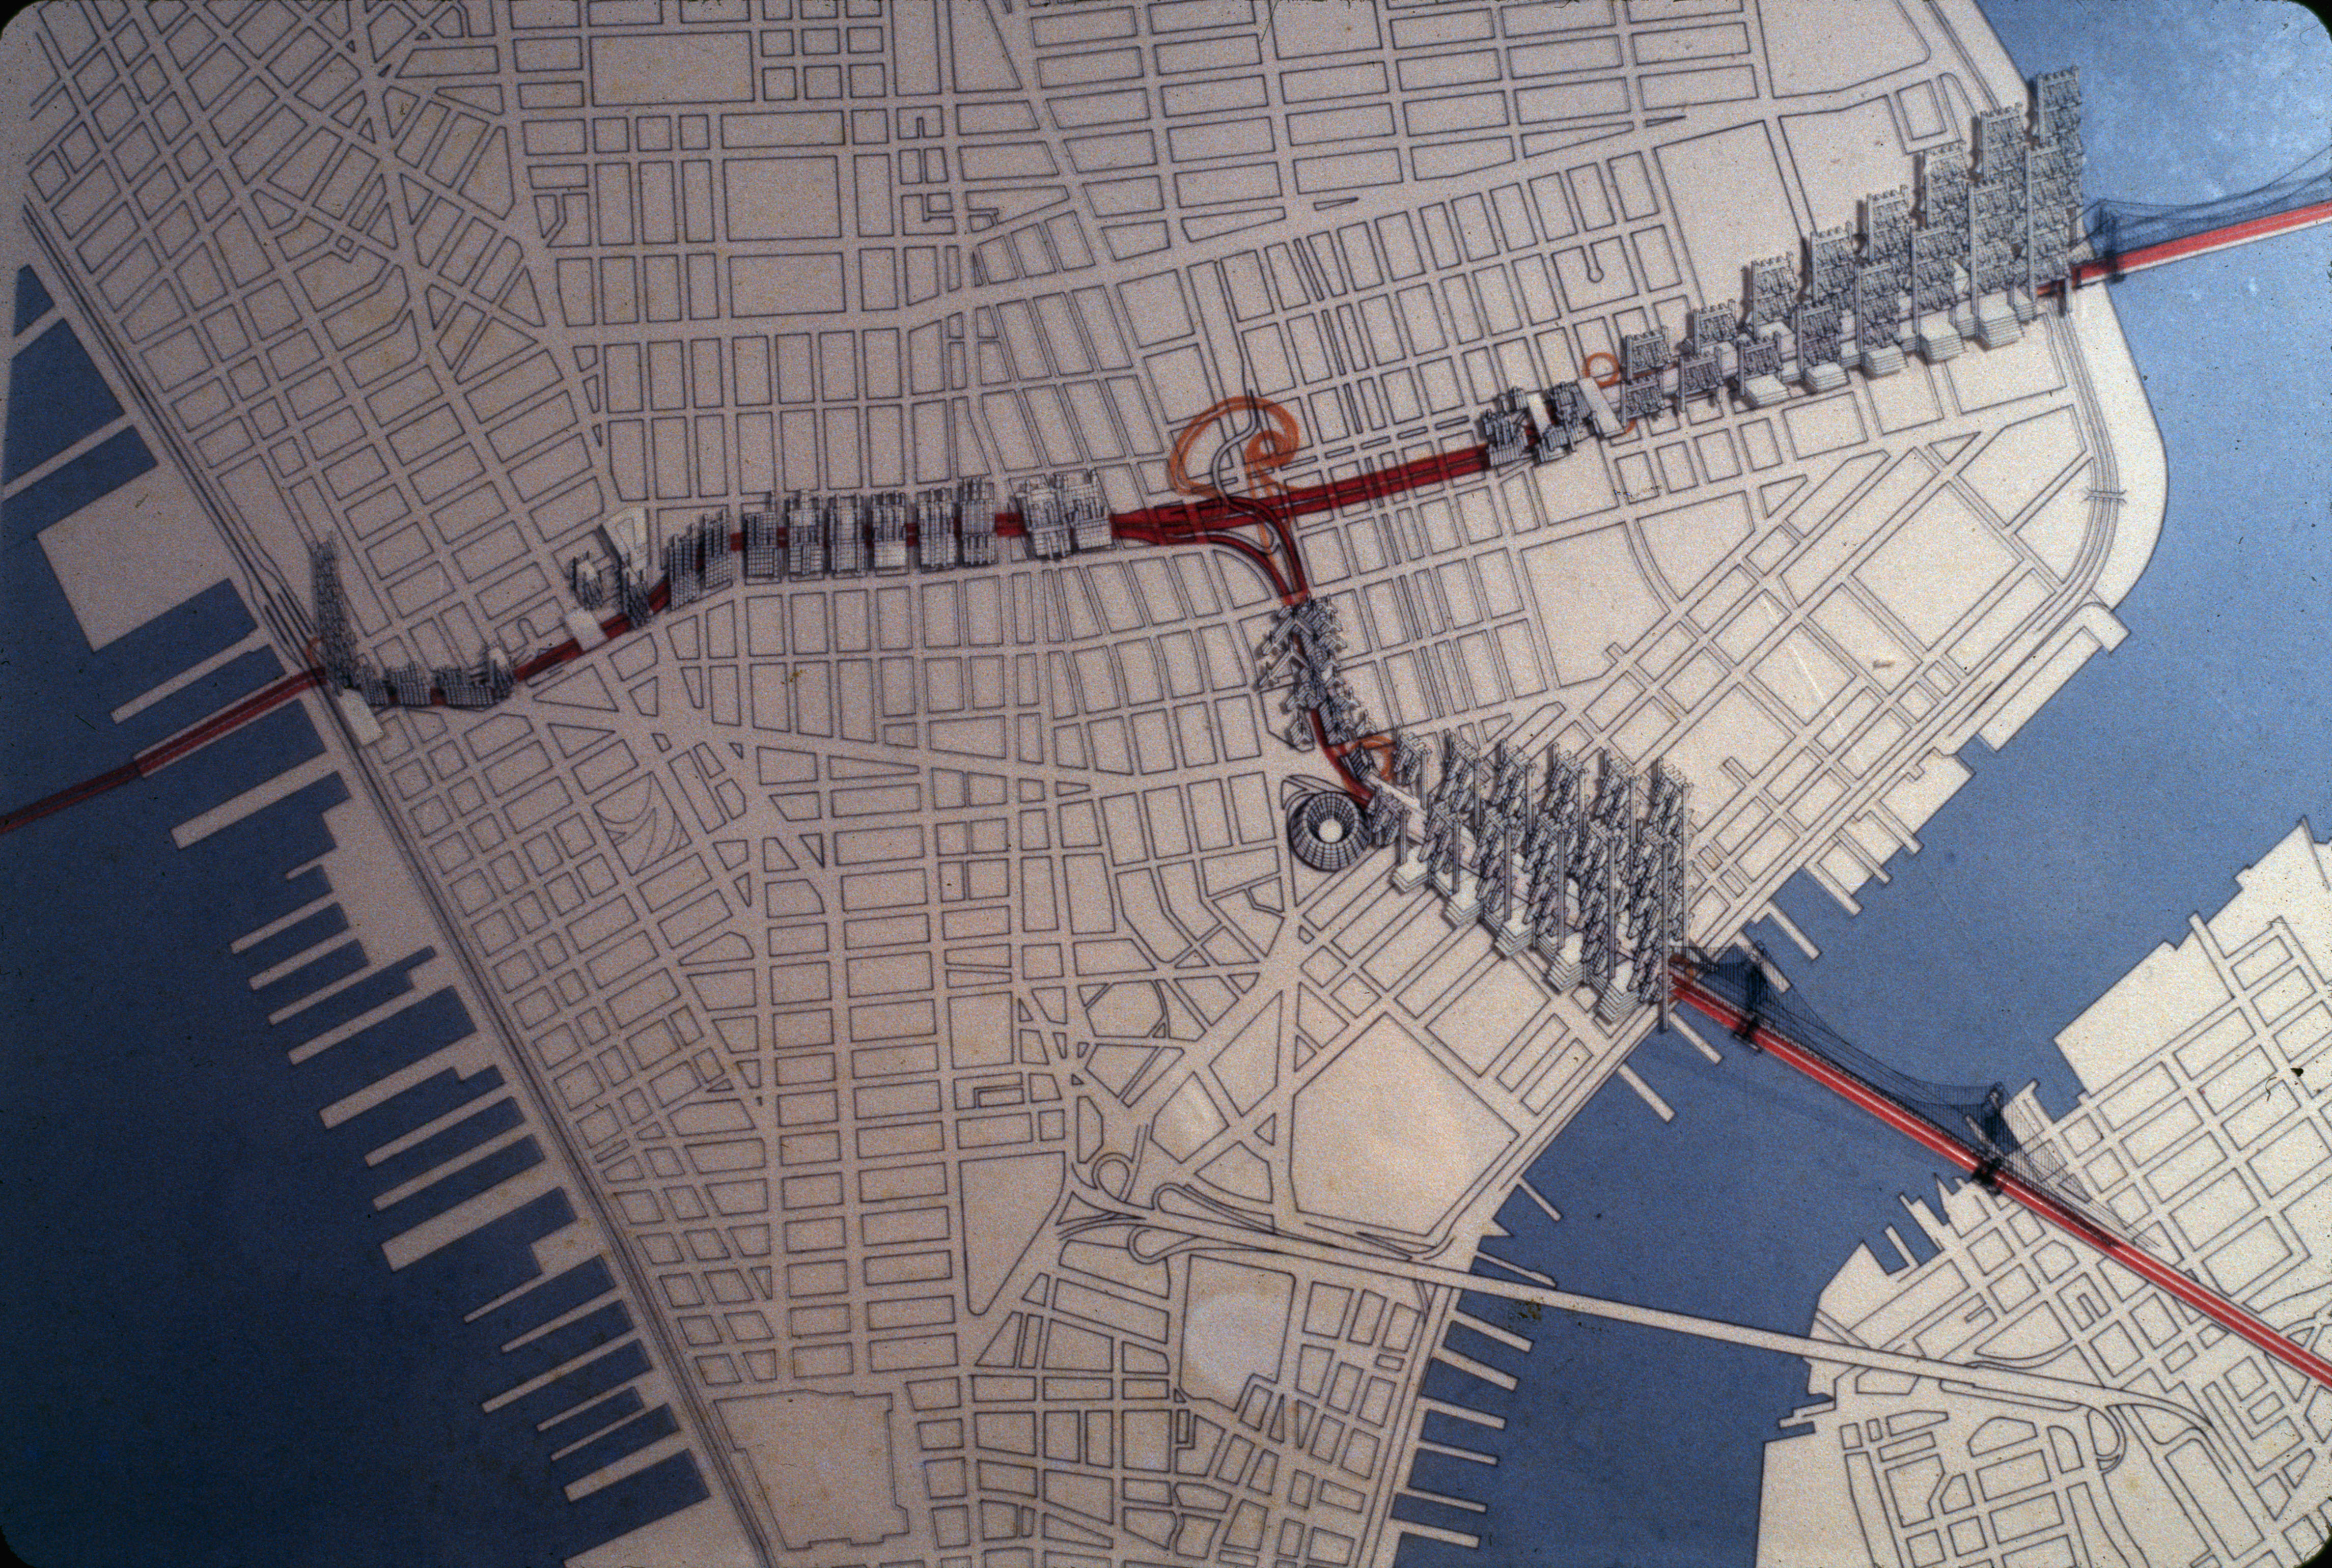 FileLower Manhattan Expressway Mapjpg Wikimedia Commons - Nyc map lower manhattan